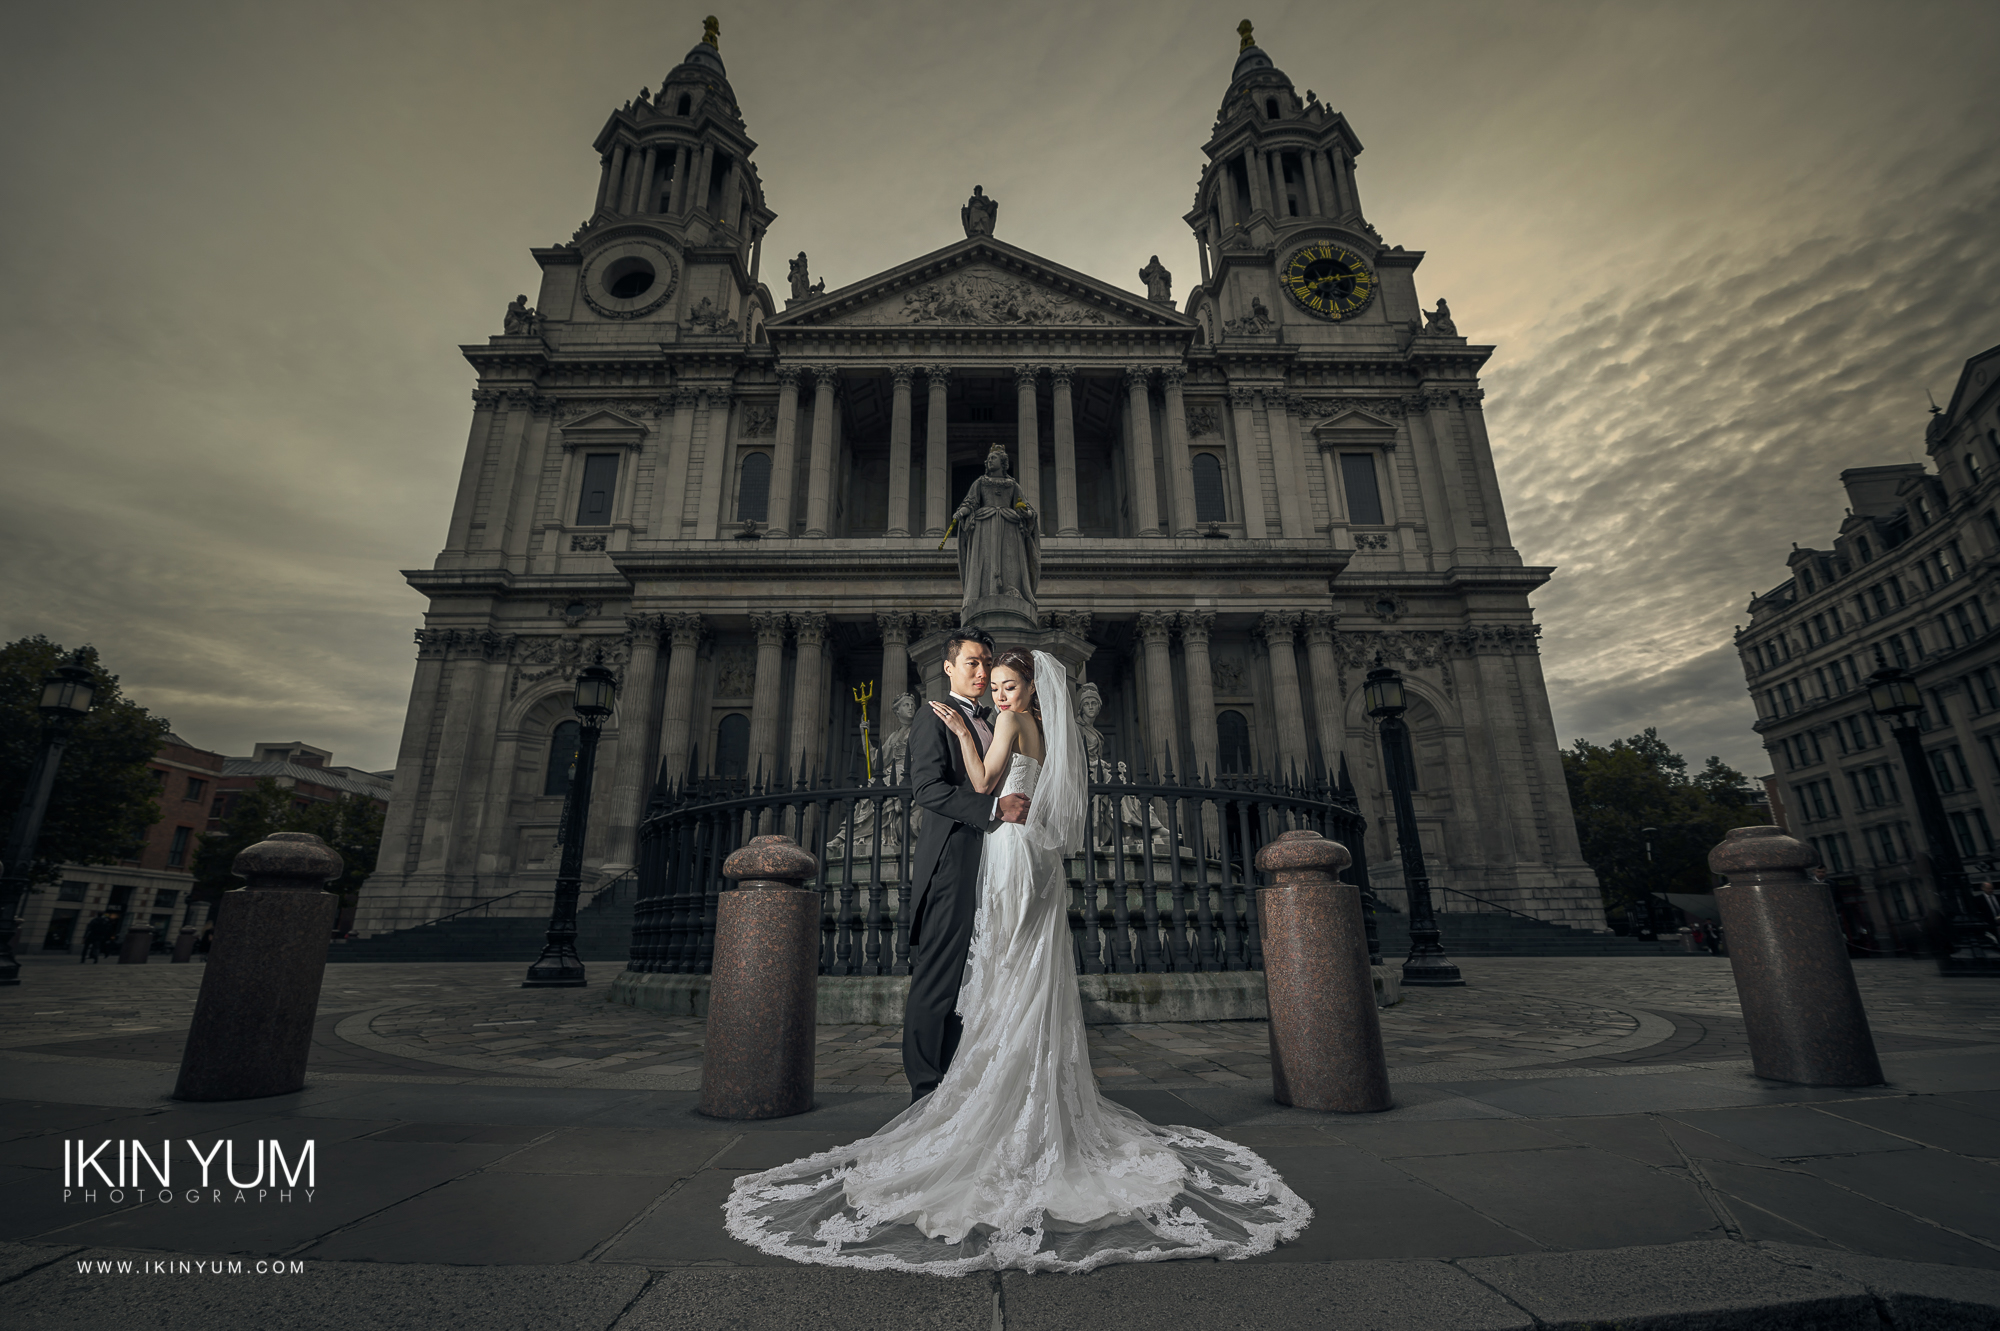 Yannis & Kenny Pre-Wedding Shoot - Ikin Yum Photography-0001.jpg